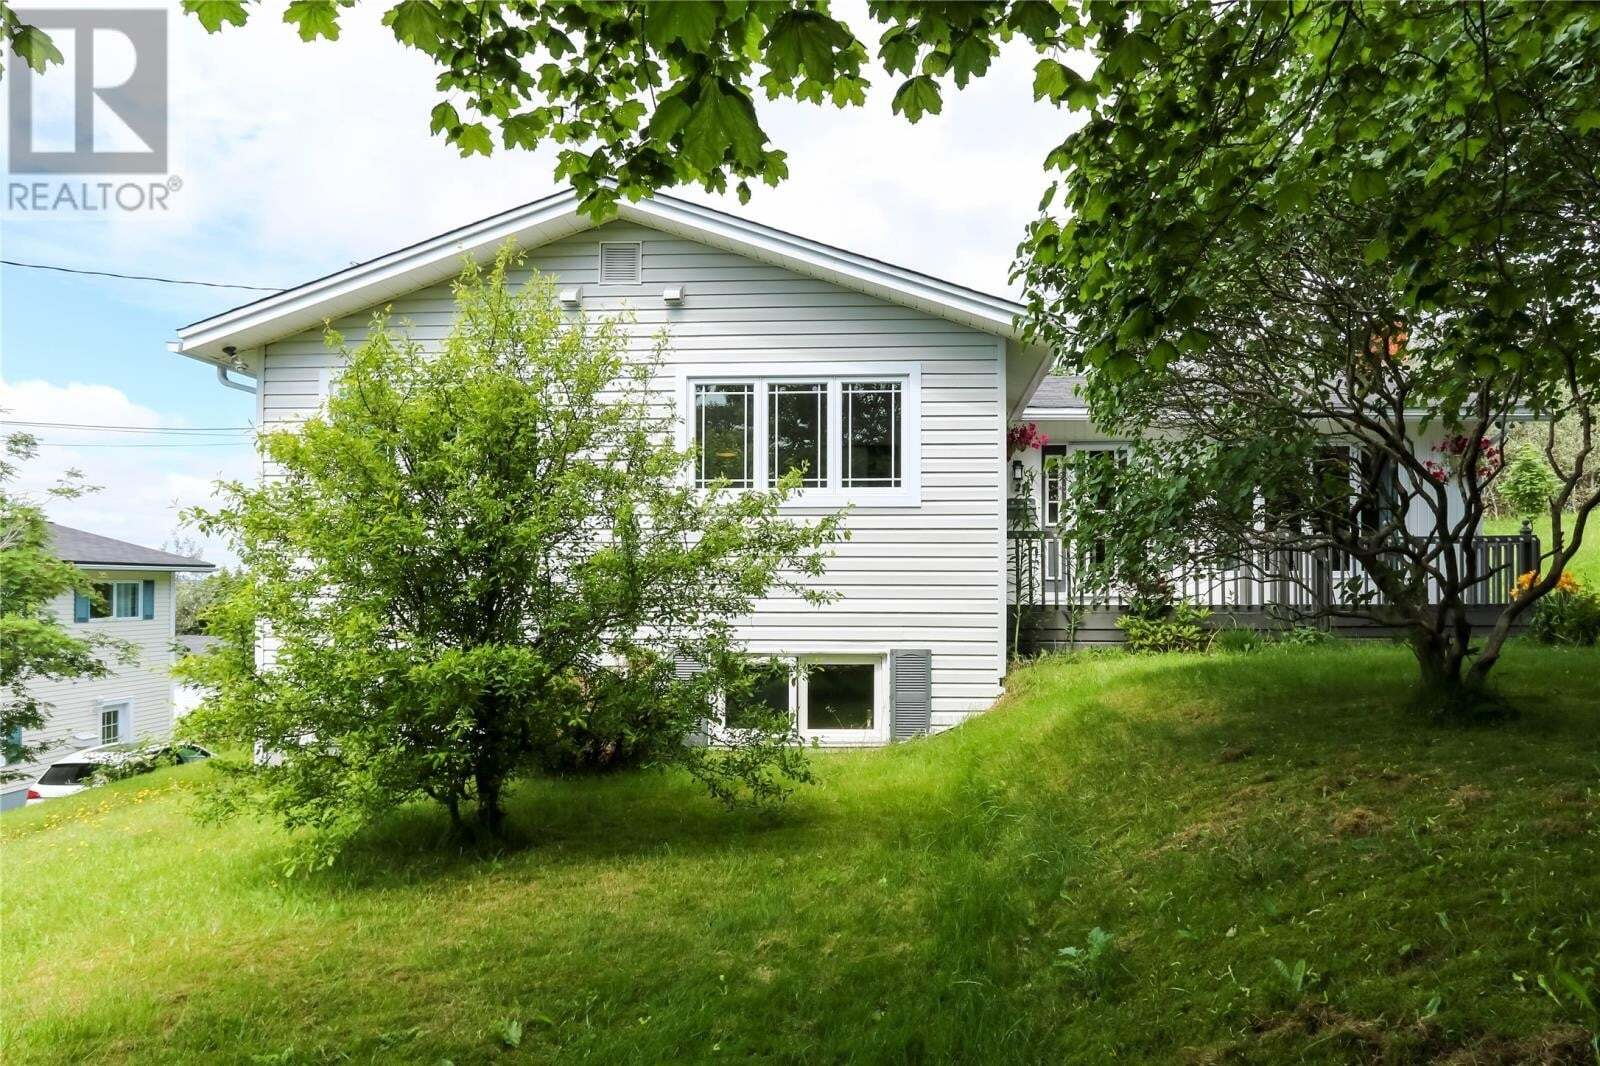 House for sale at 27 Densmore's Ln St. John's Newfoundland - MLS: 1217364